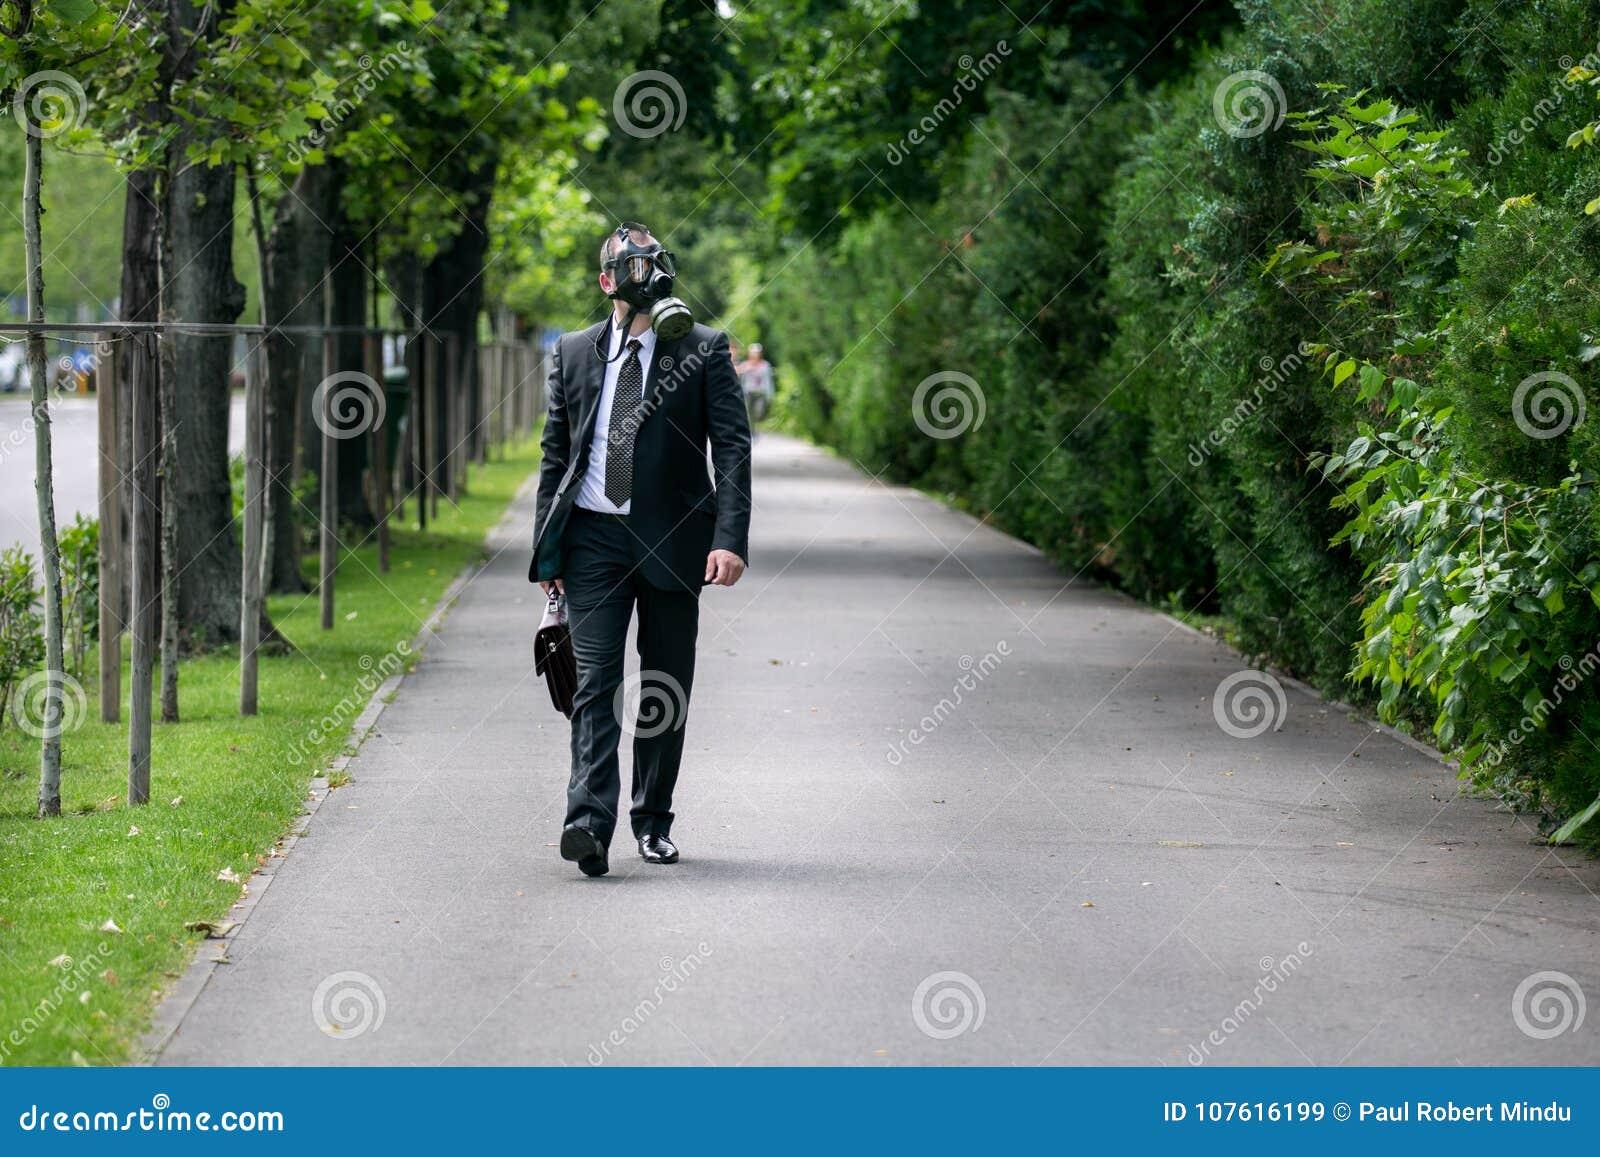 Zakenman openlucht lopen dragend een gasmasker op het gezicht